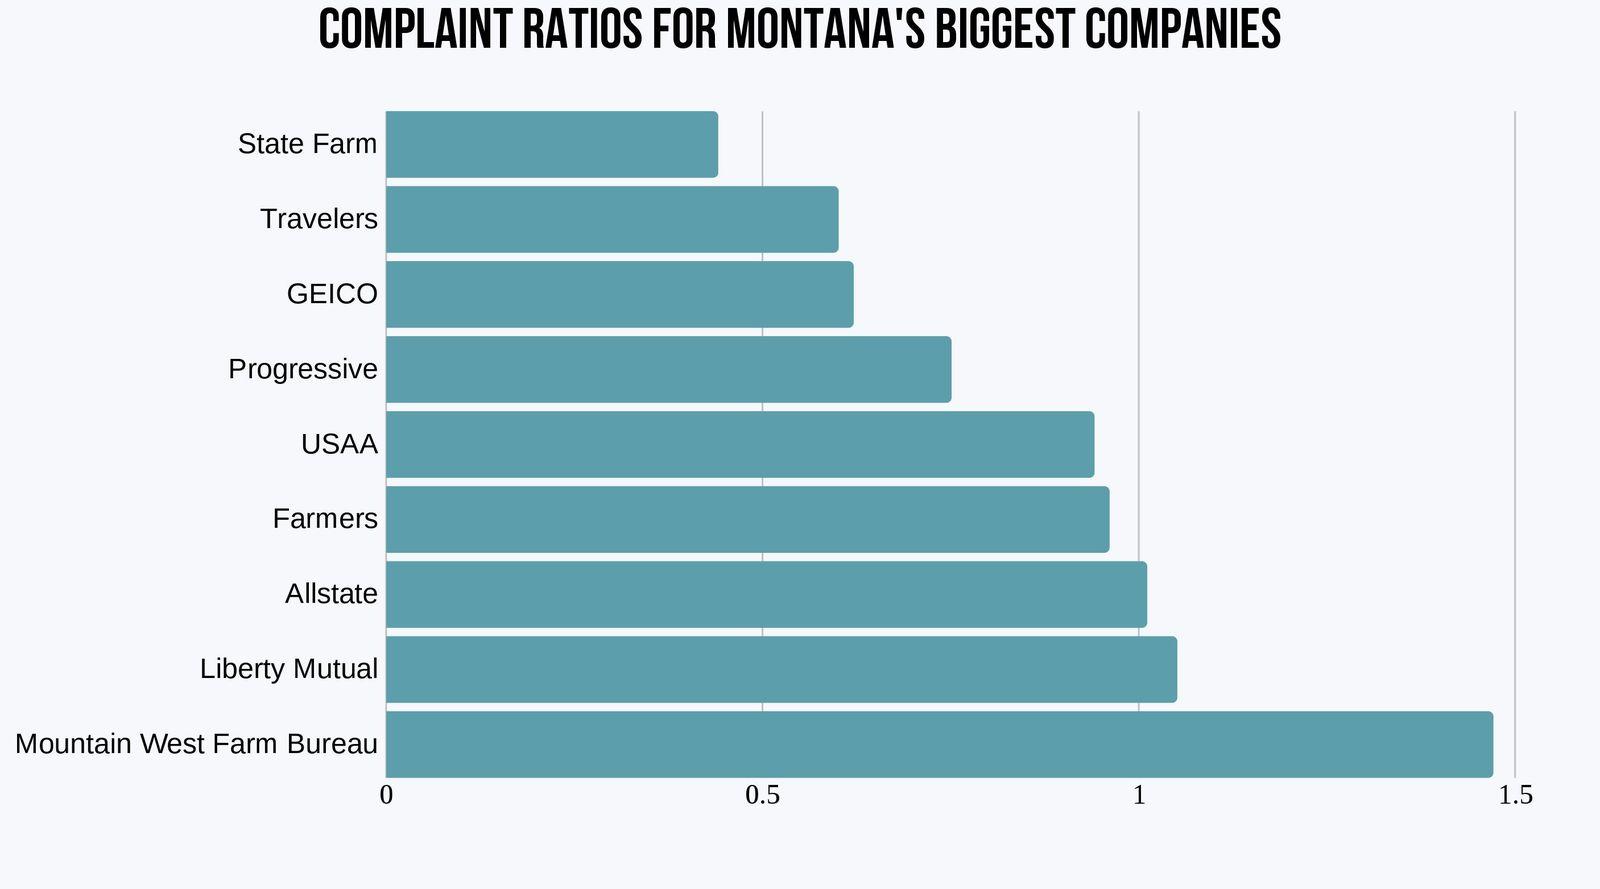 Montana's largest car insurance companies' complaint ratios